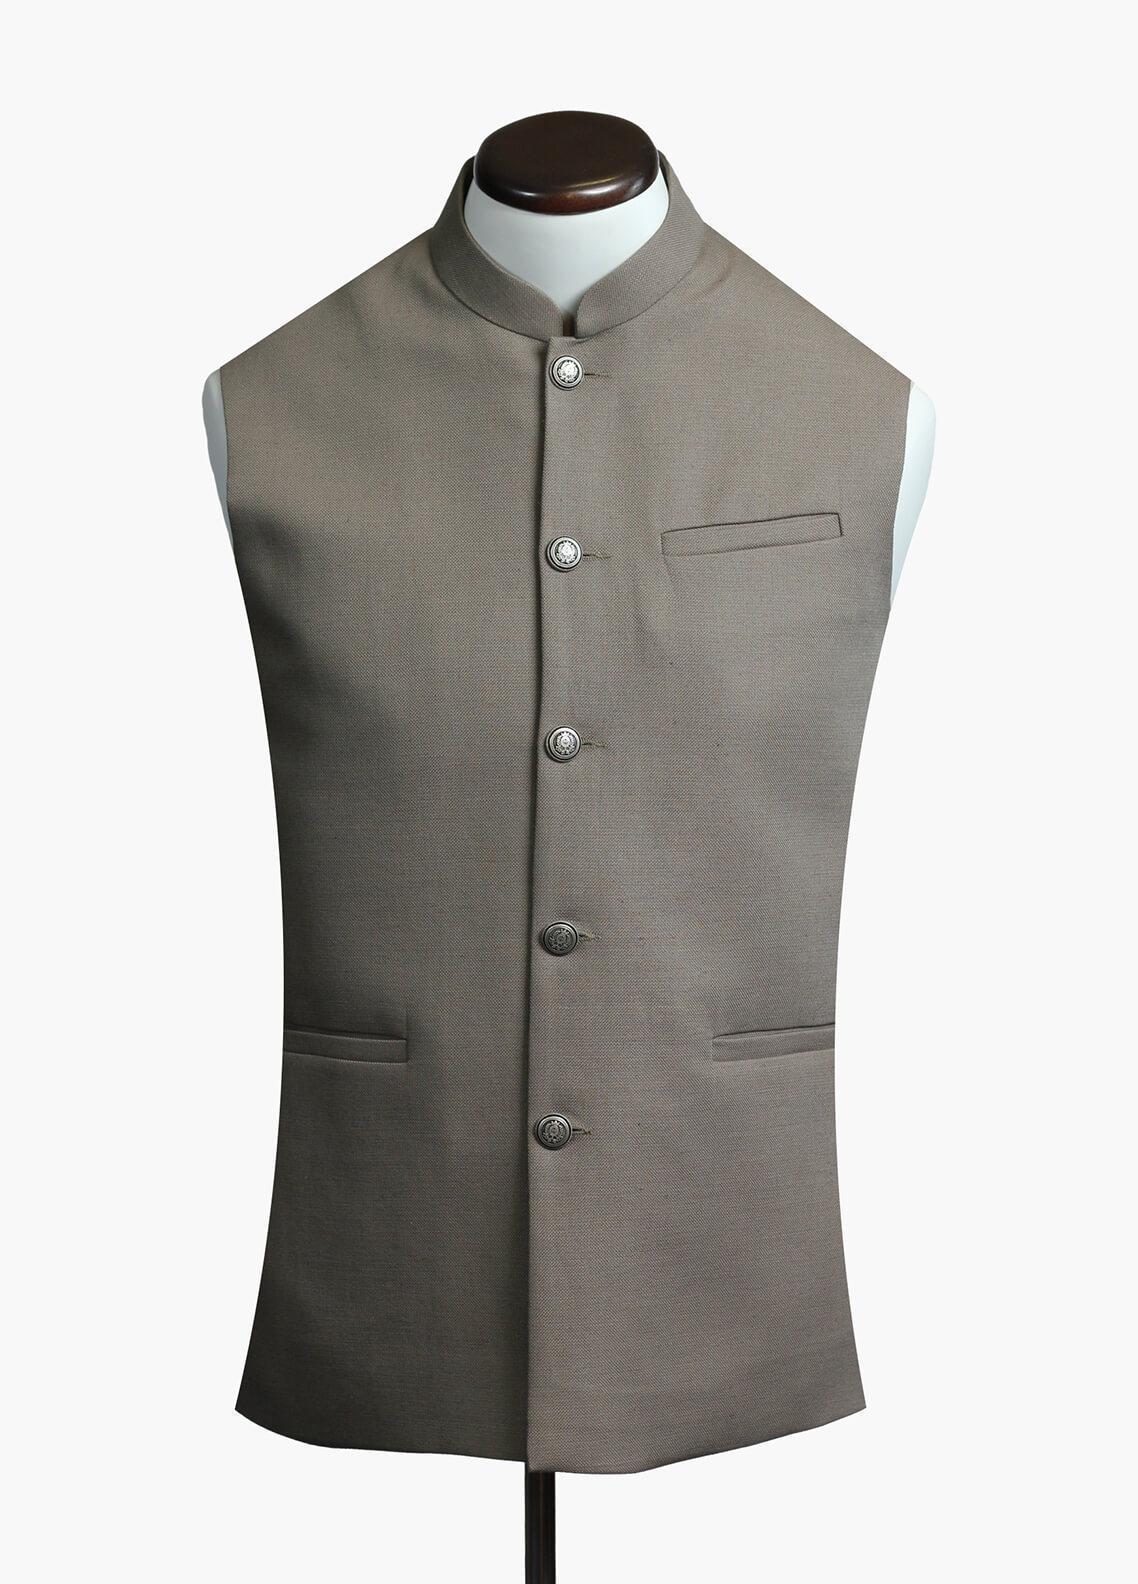 Brumano Linen Formal Waistcoat for Men - Khaaki BRM-715